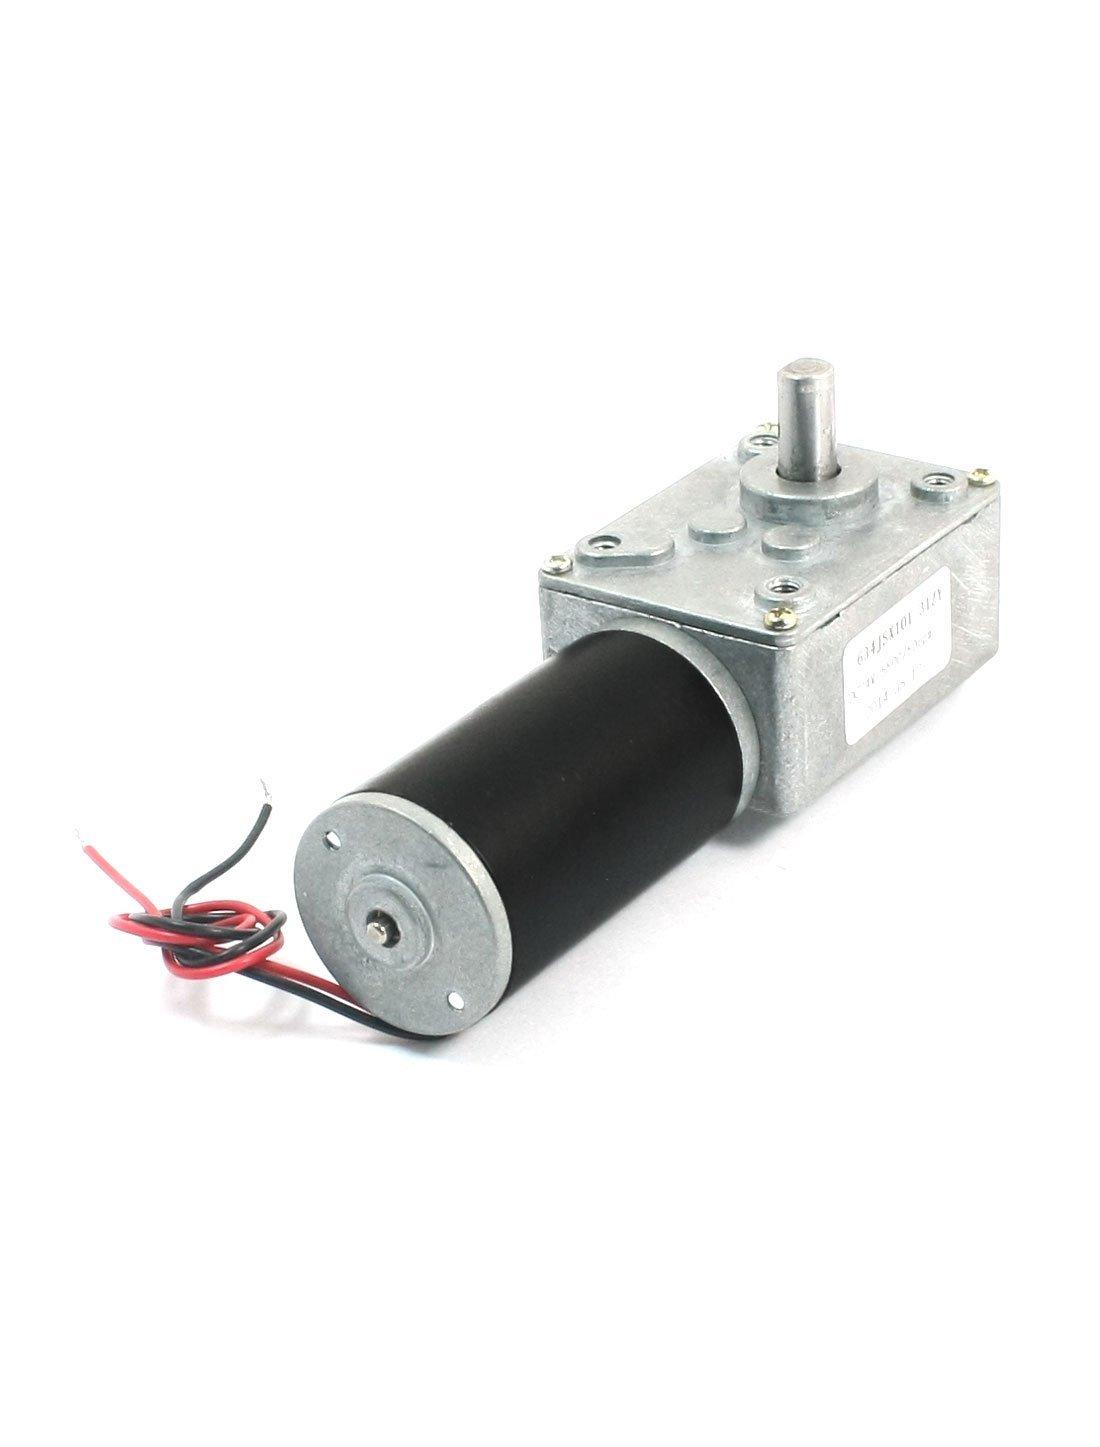 Amazon.com: eDealMax 19cm de Largo de Doble alambre de Plomo 5500/50 RPM Velocidad Reducir Worm Gear Motor DC24V: Electronics